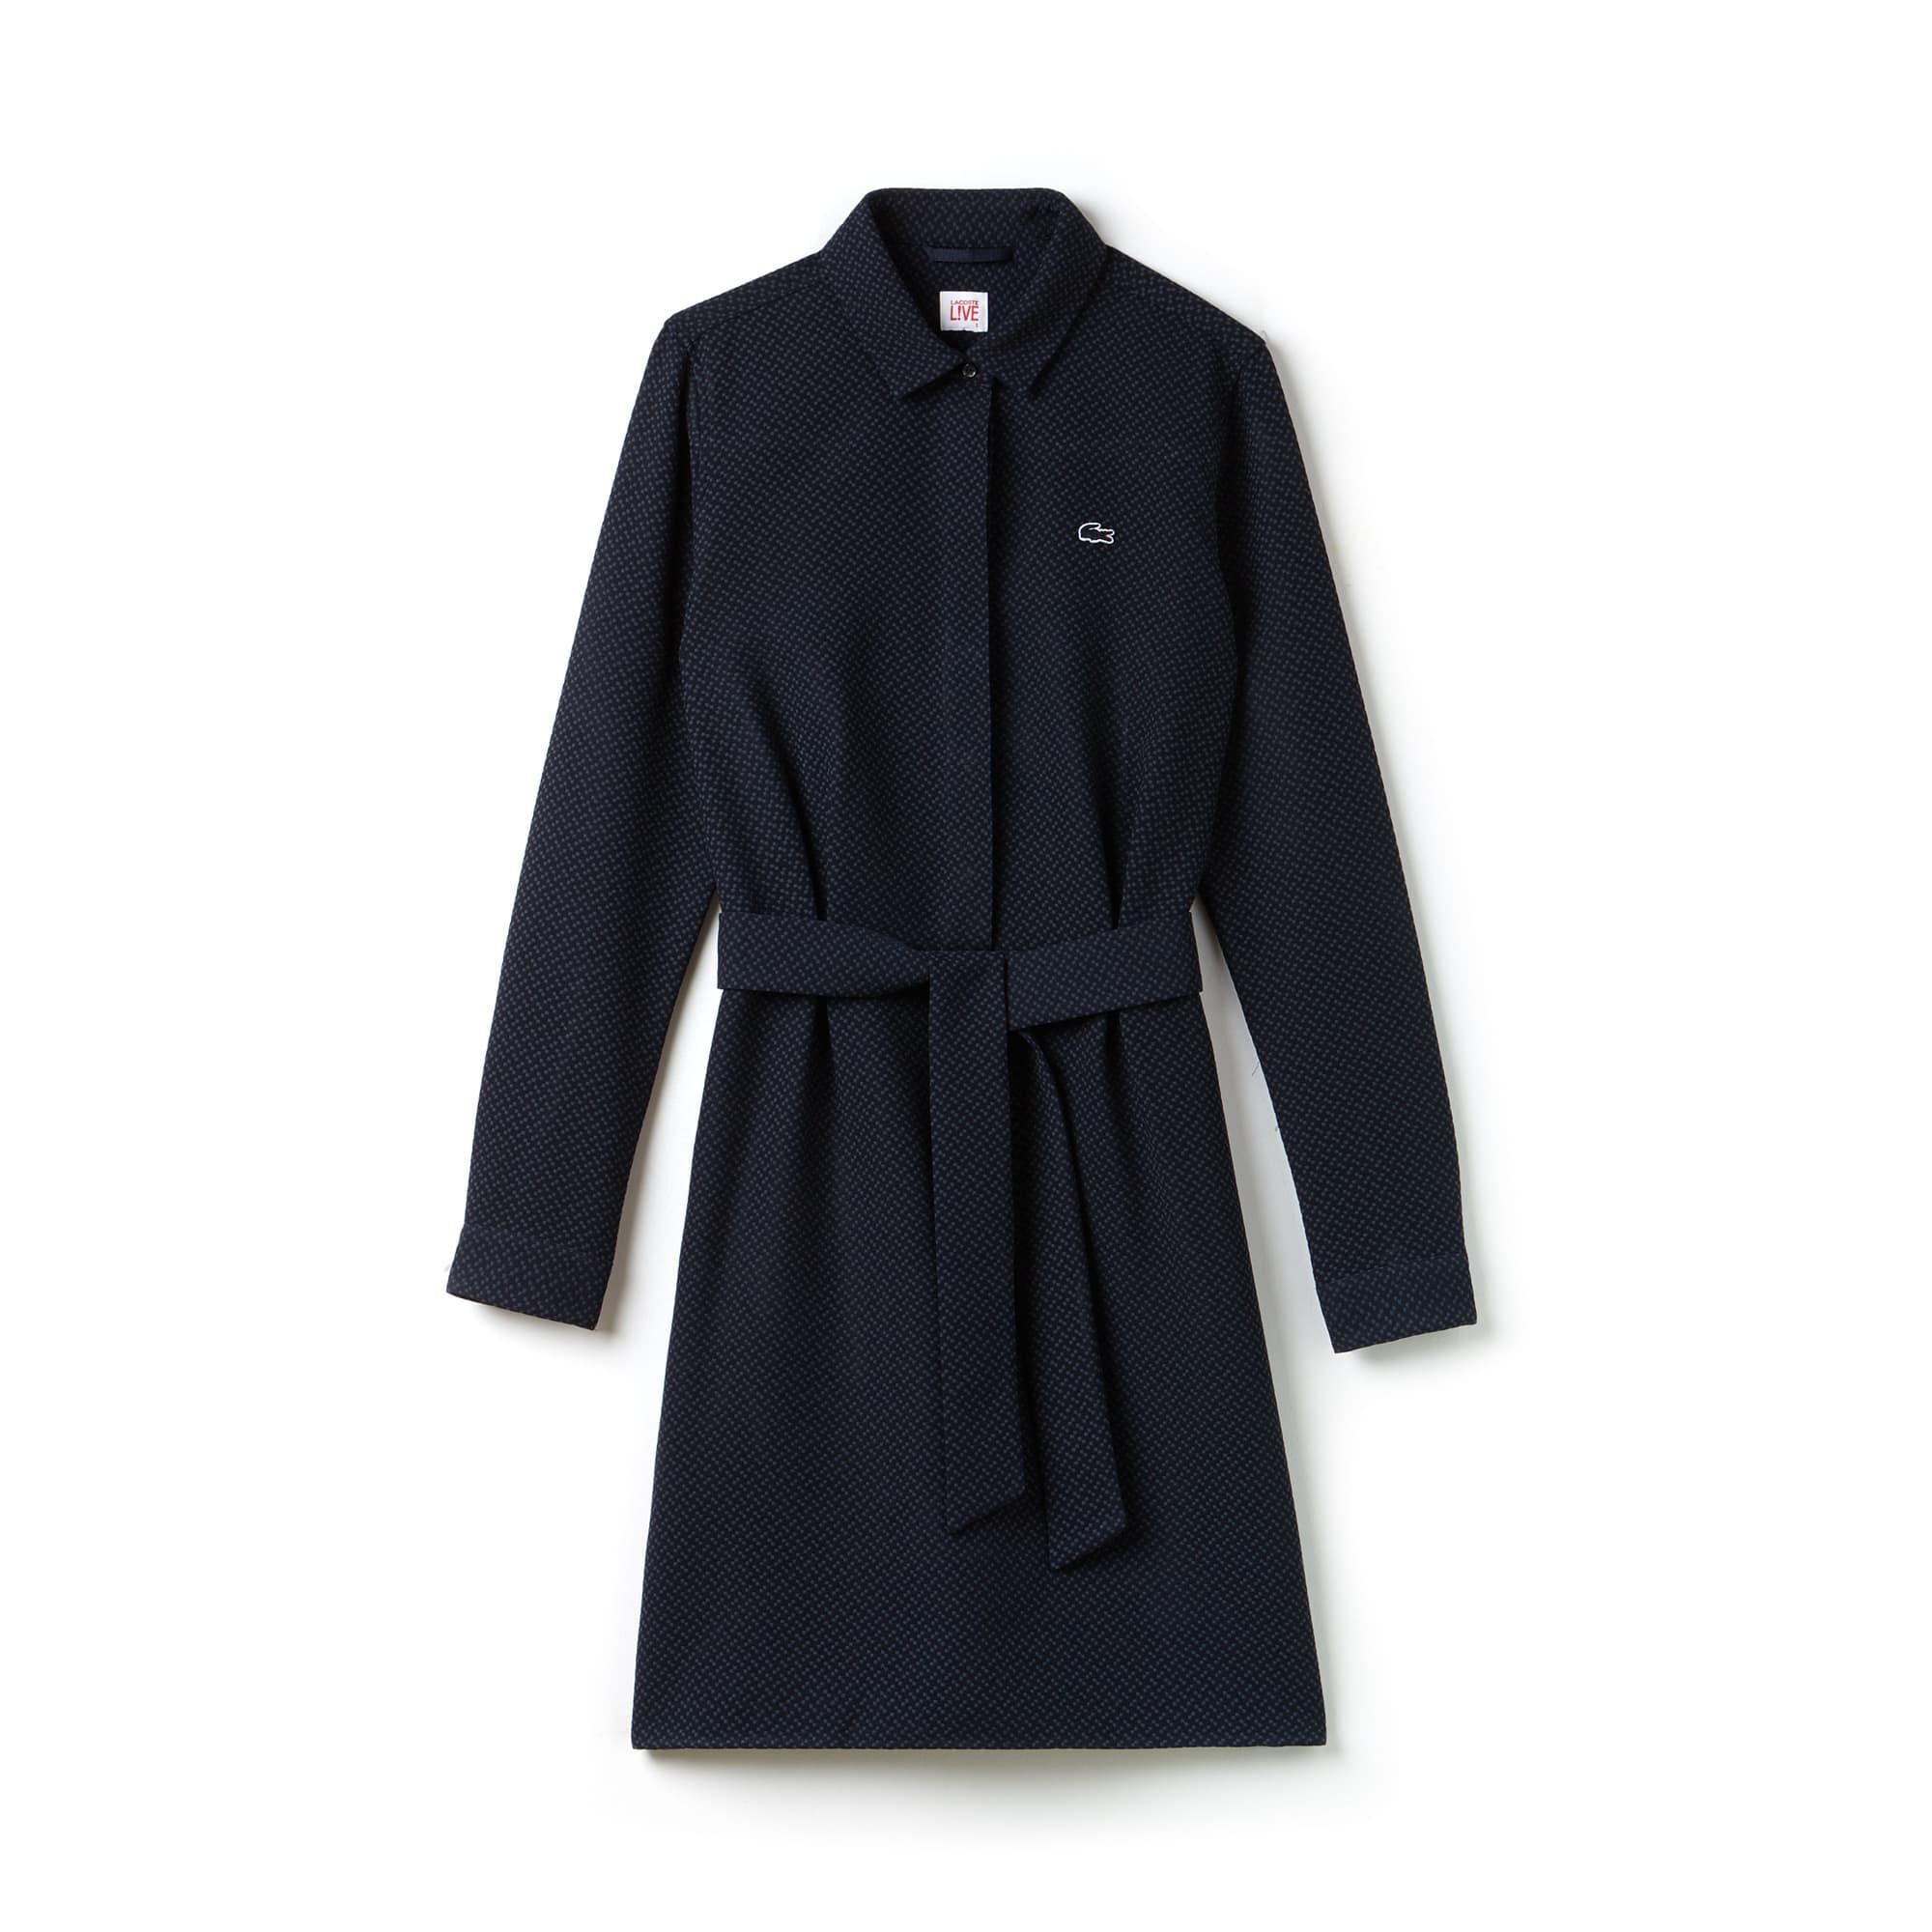 Women's Lacoste LIVE Jacquard Dress